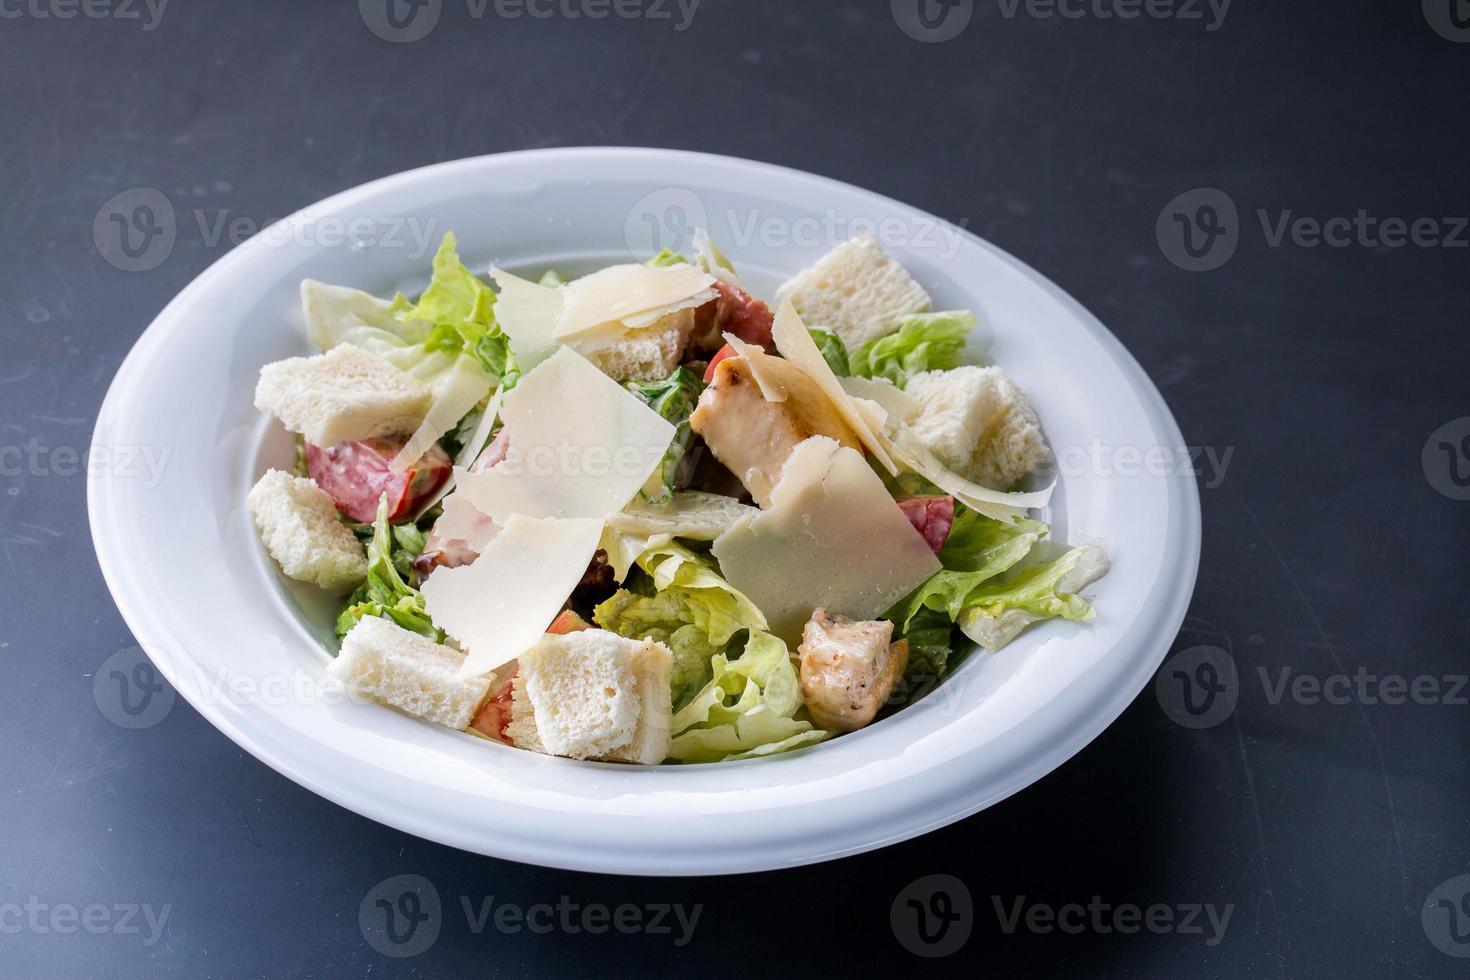 gezonde gegrilde kip caesar salade met kaas en croutons op foto